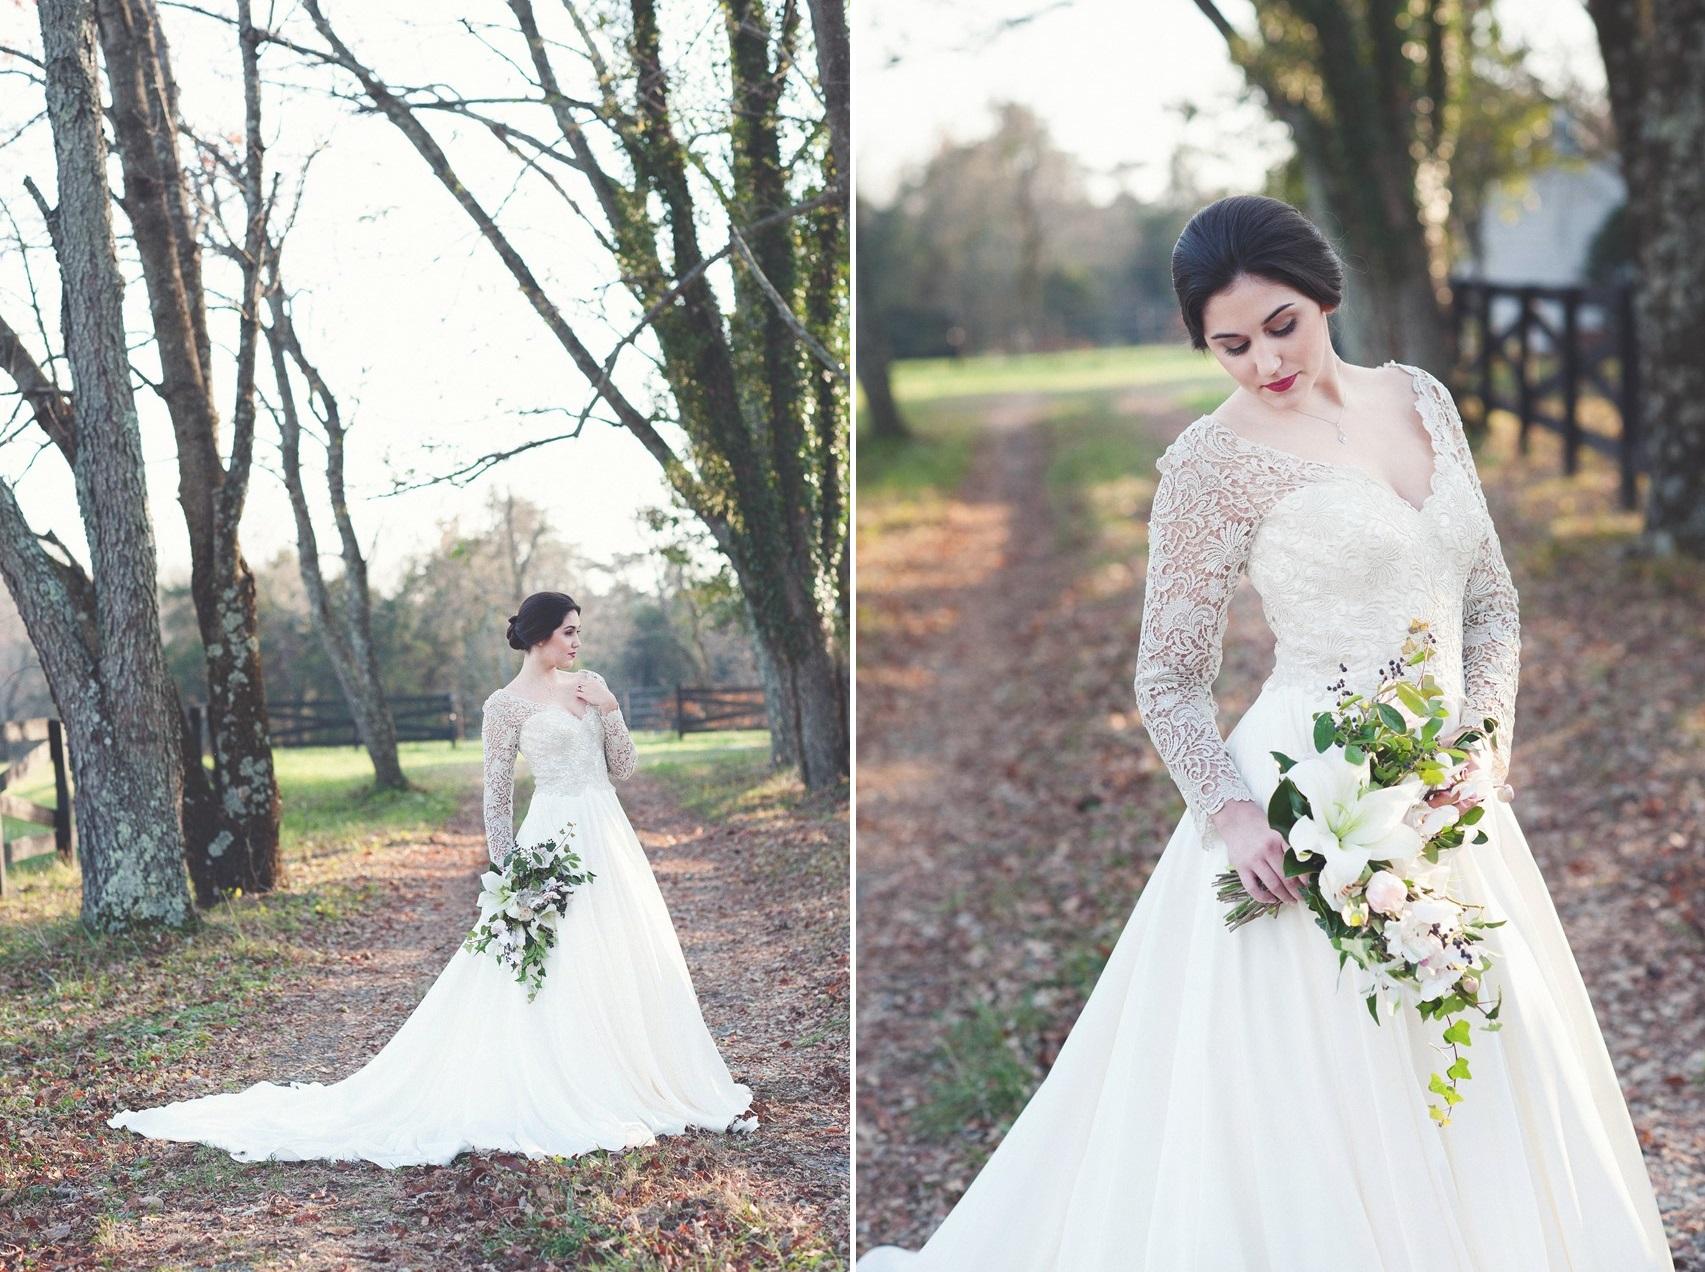 Timelessly Elegant White Bridal Bouquet